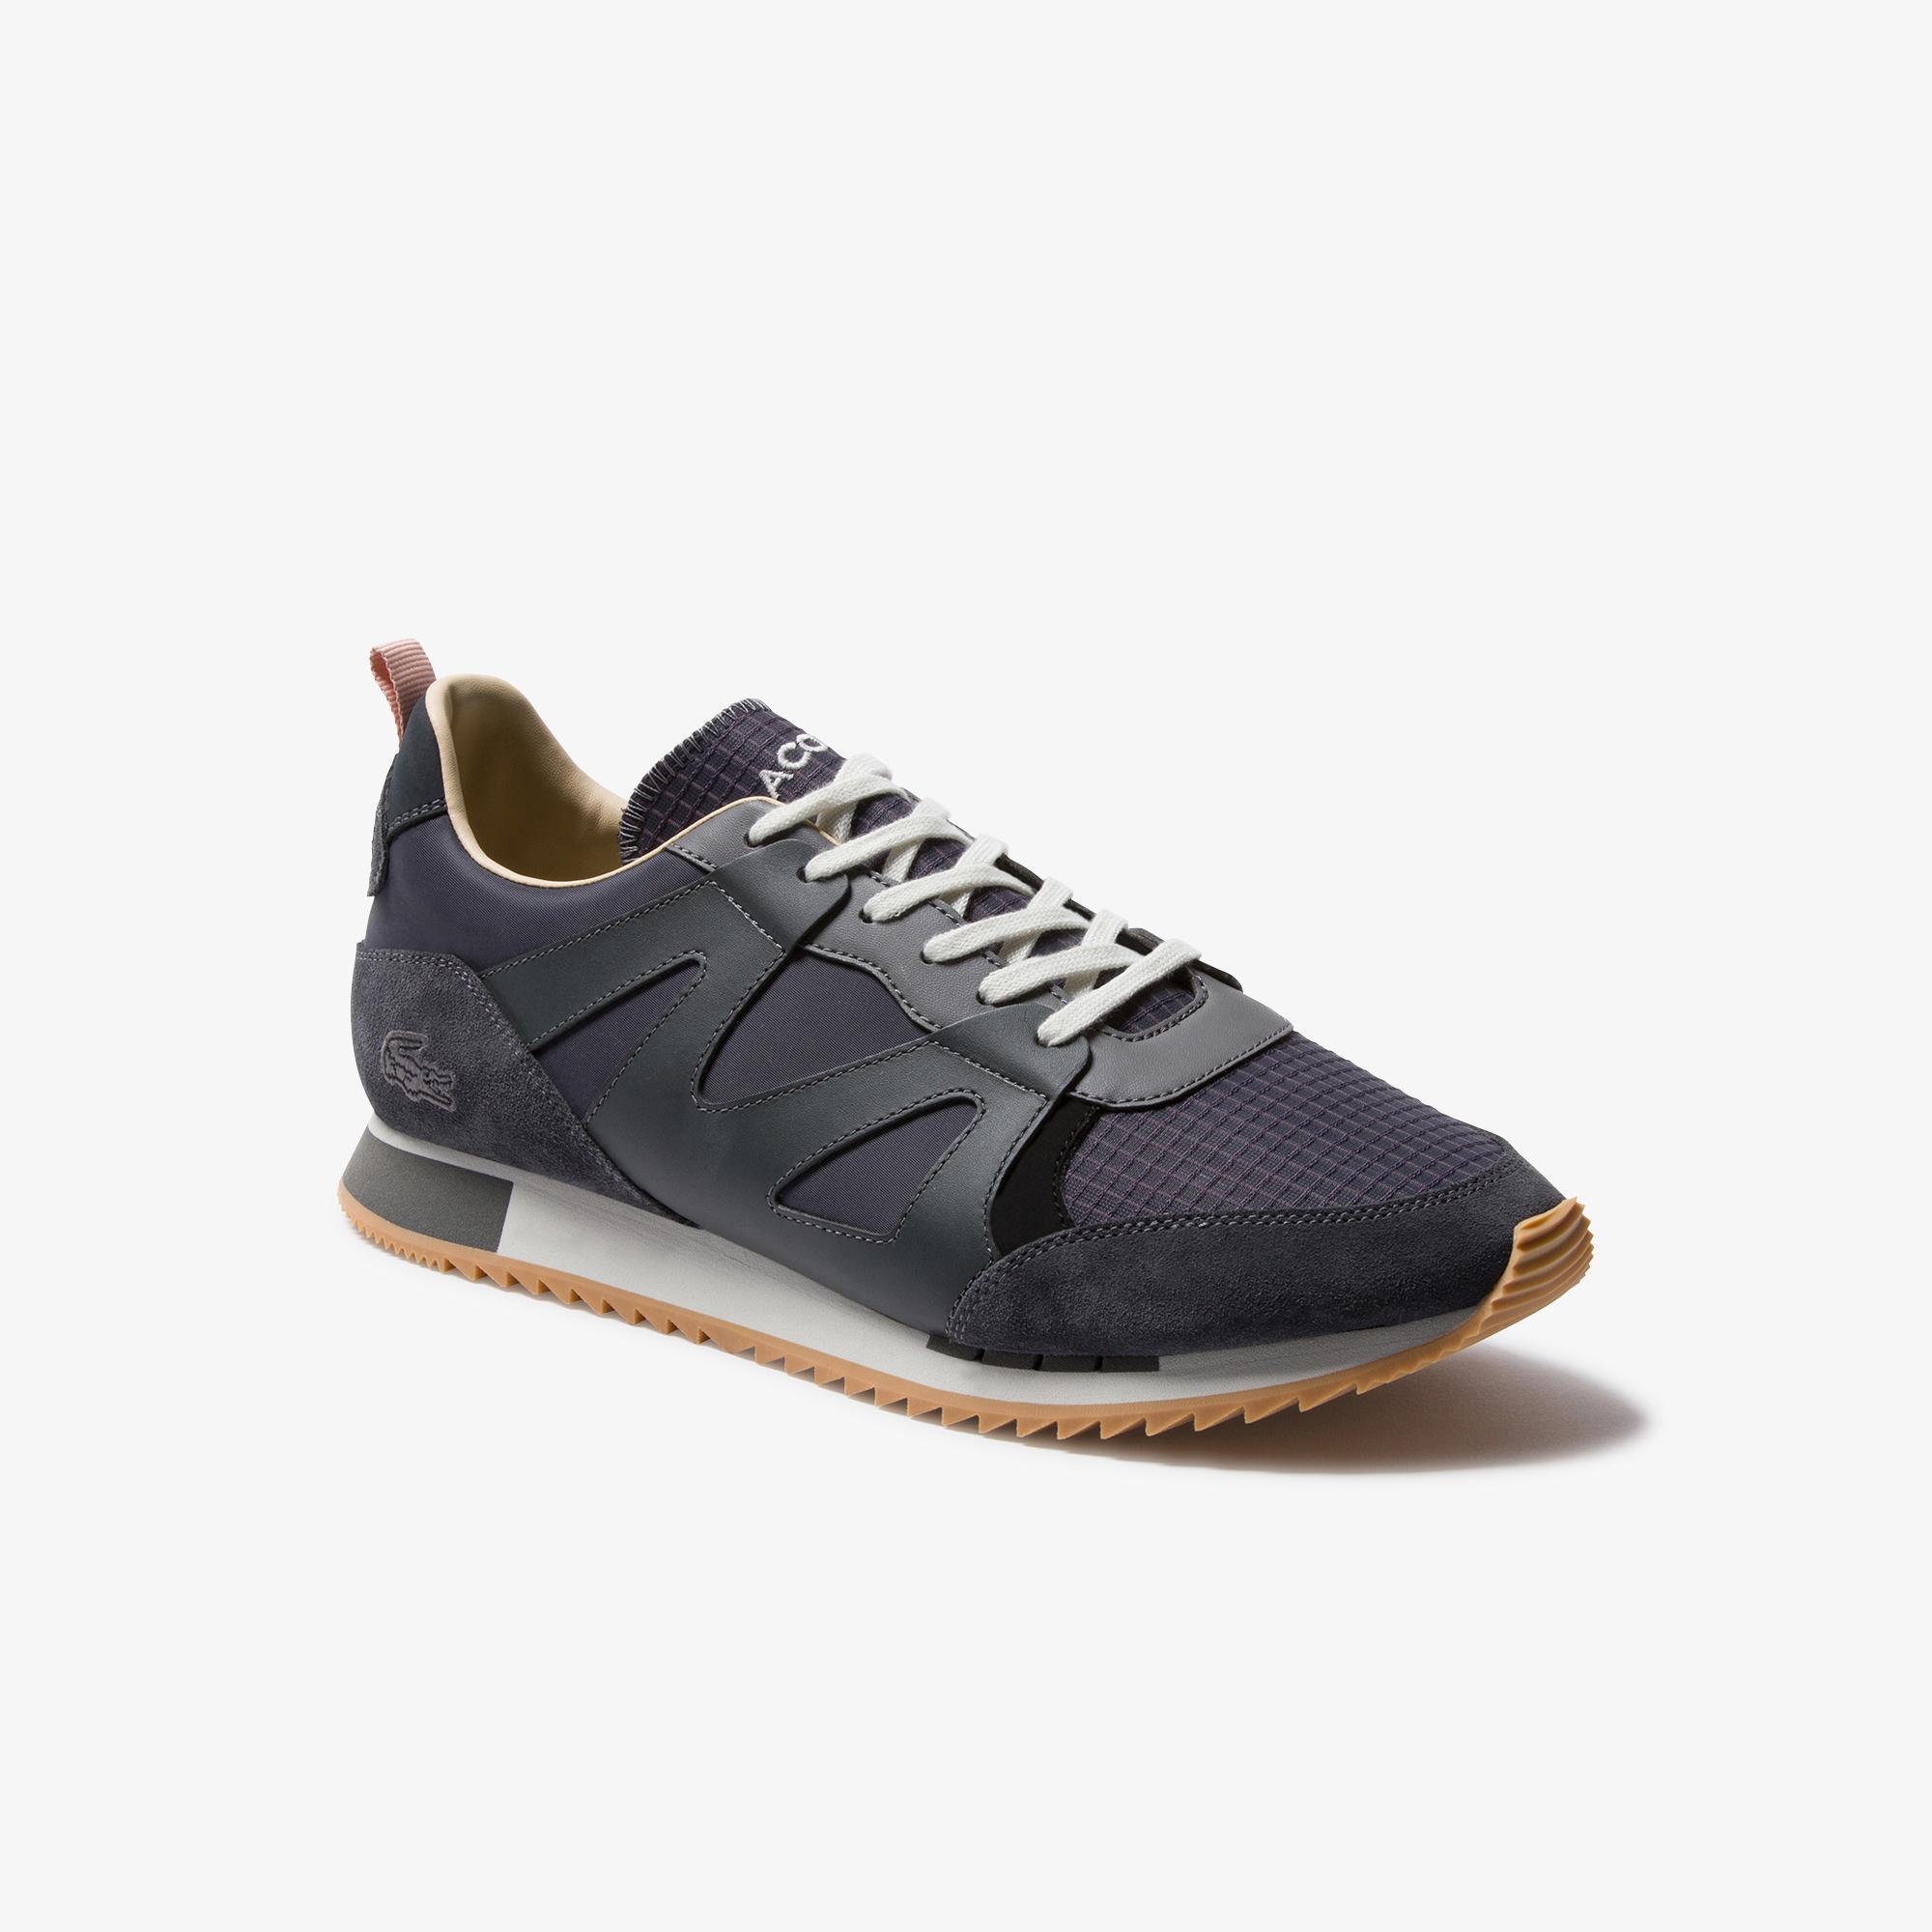 Lacoste Aesthet 120 3 Men's Sneakers